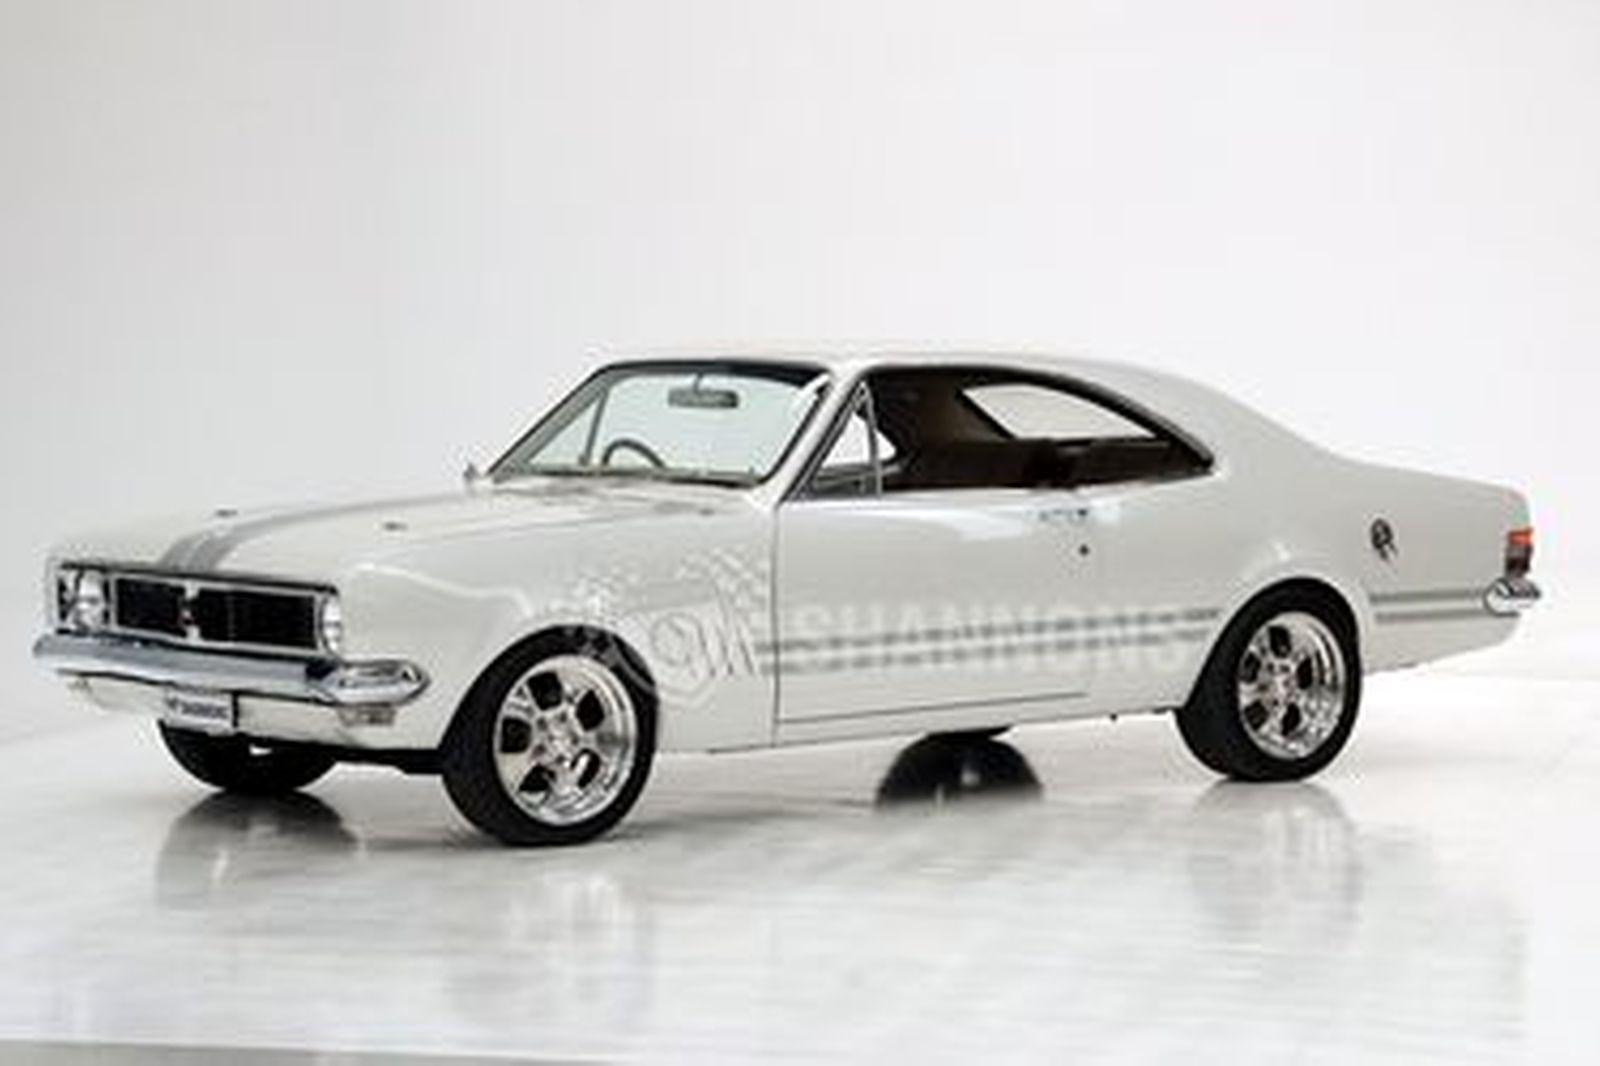 Holden HT Monaro 'Modified' 383 V8 Coupe